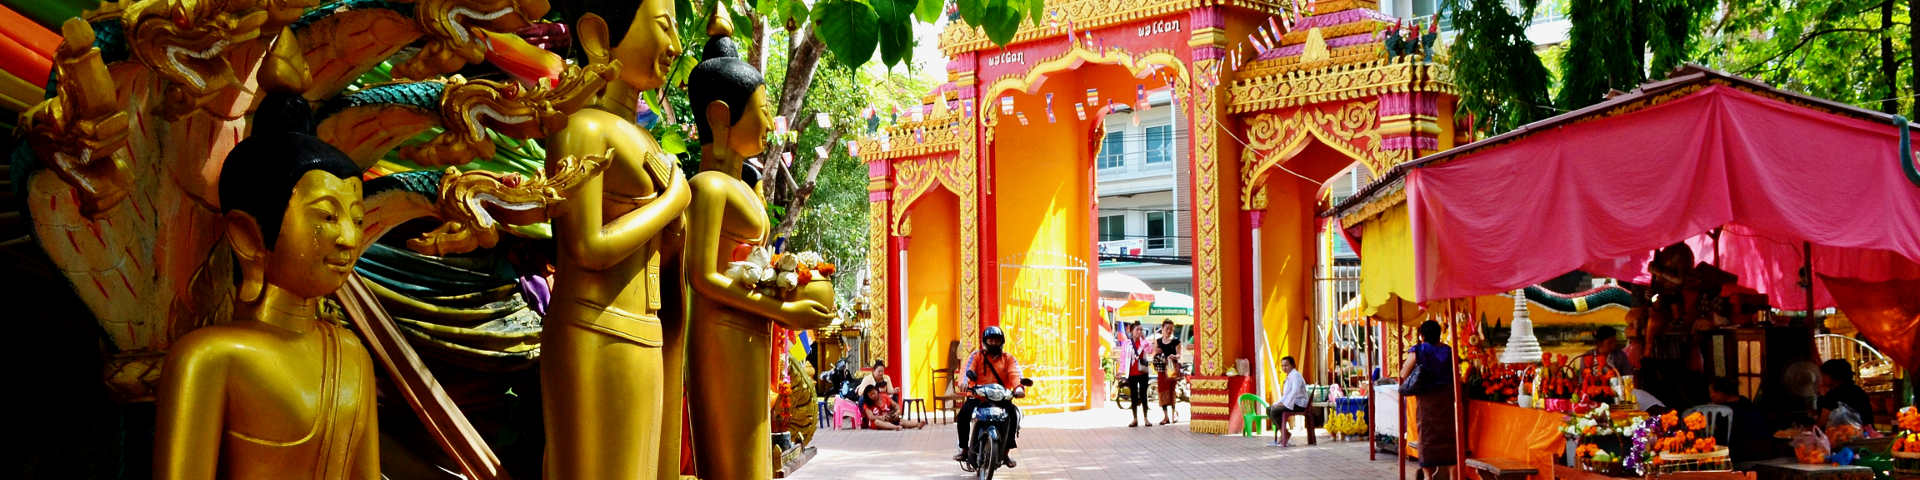 Vientiane hero